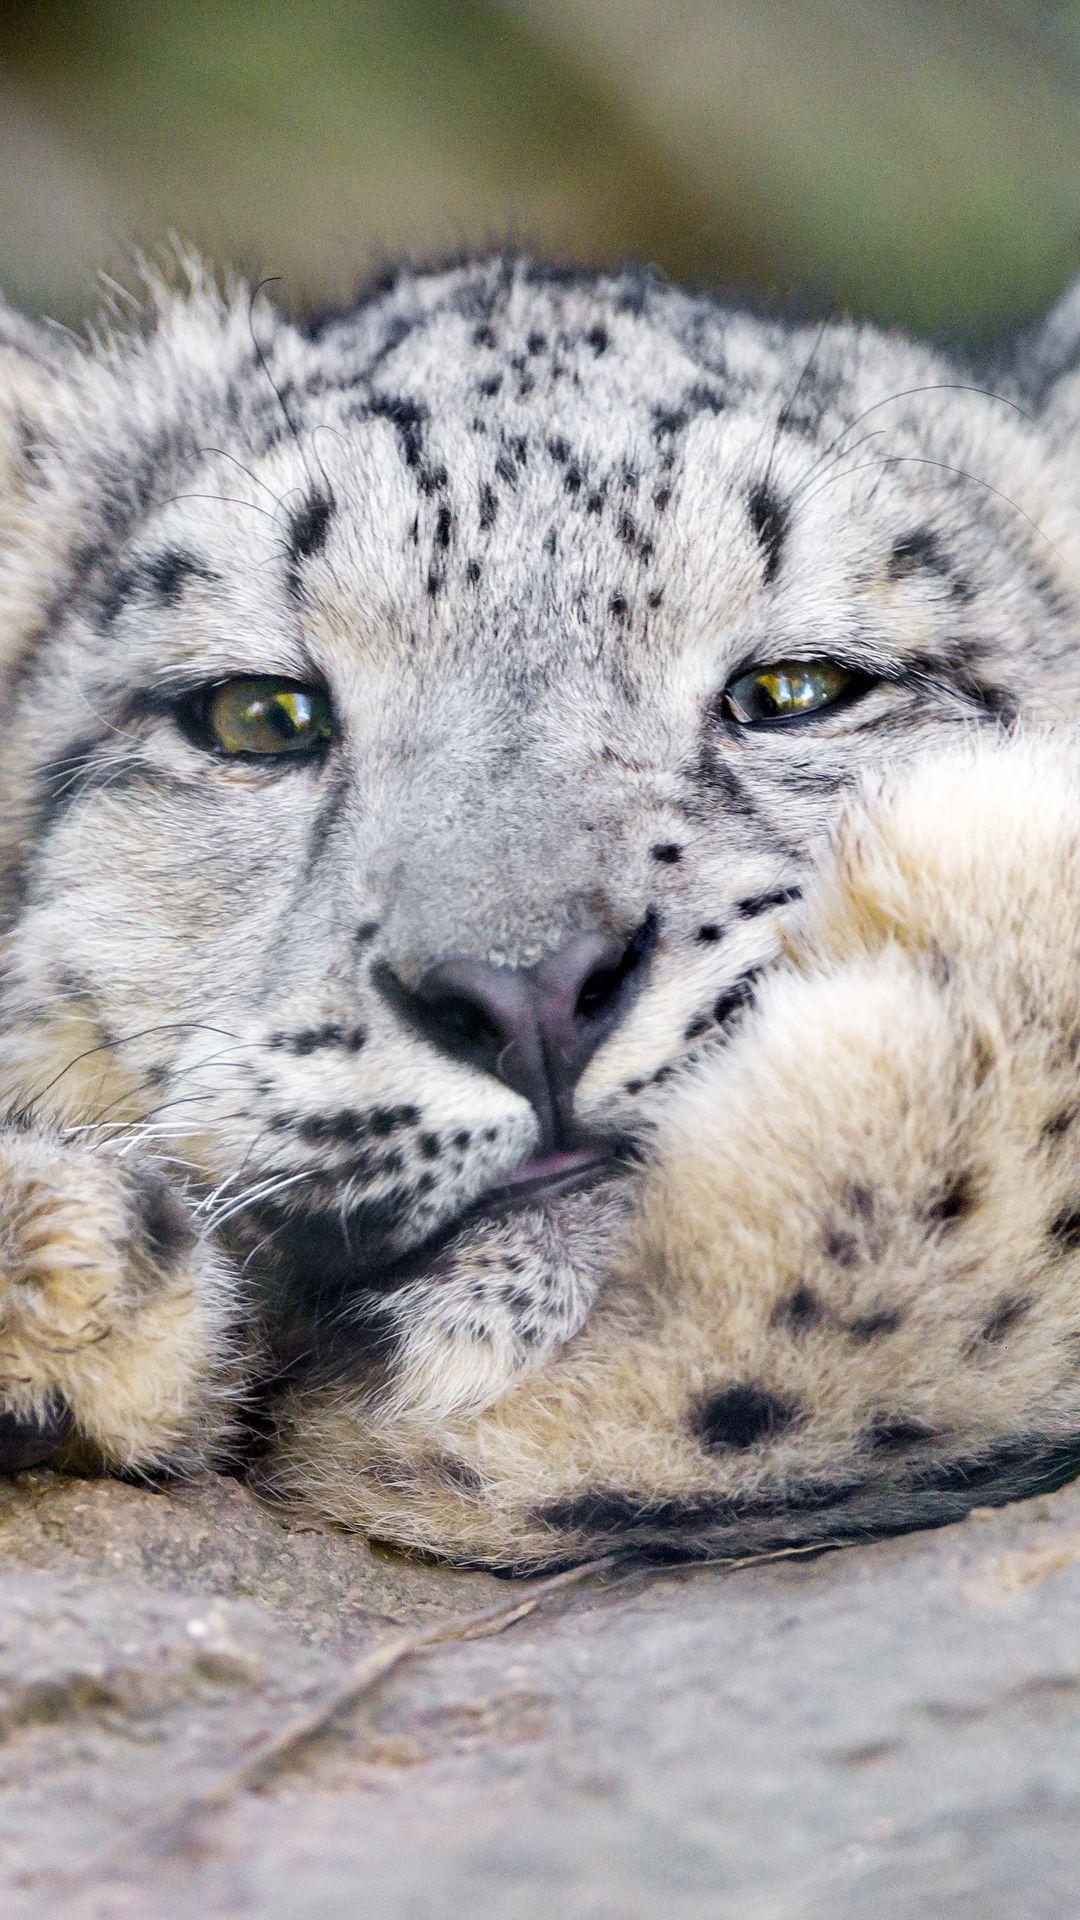 Leopard Snow Leopard Big Cat Animals Wallpaper Lockscreen Mobile Android Ios Infinitywallpaper Snow Leopard Big Cats Snow Leopard Wallpaper